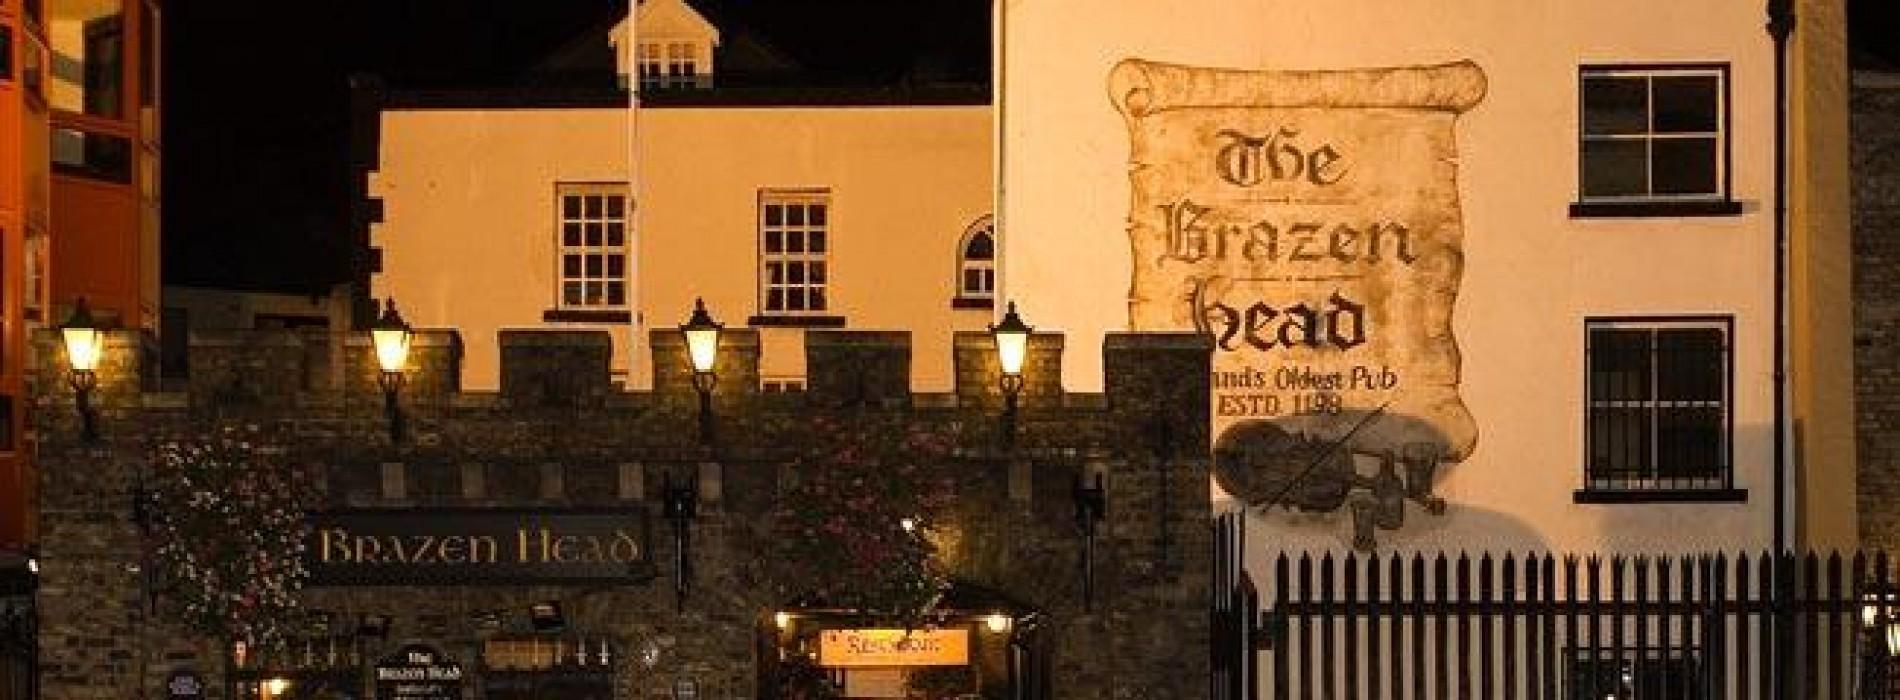 The Brazen Head Pub – A Secret History